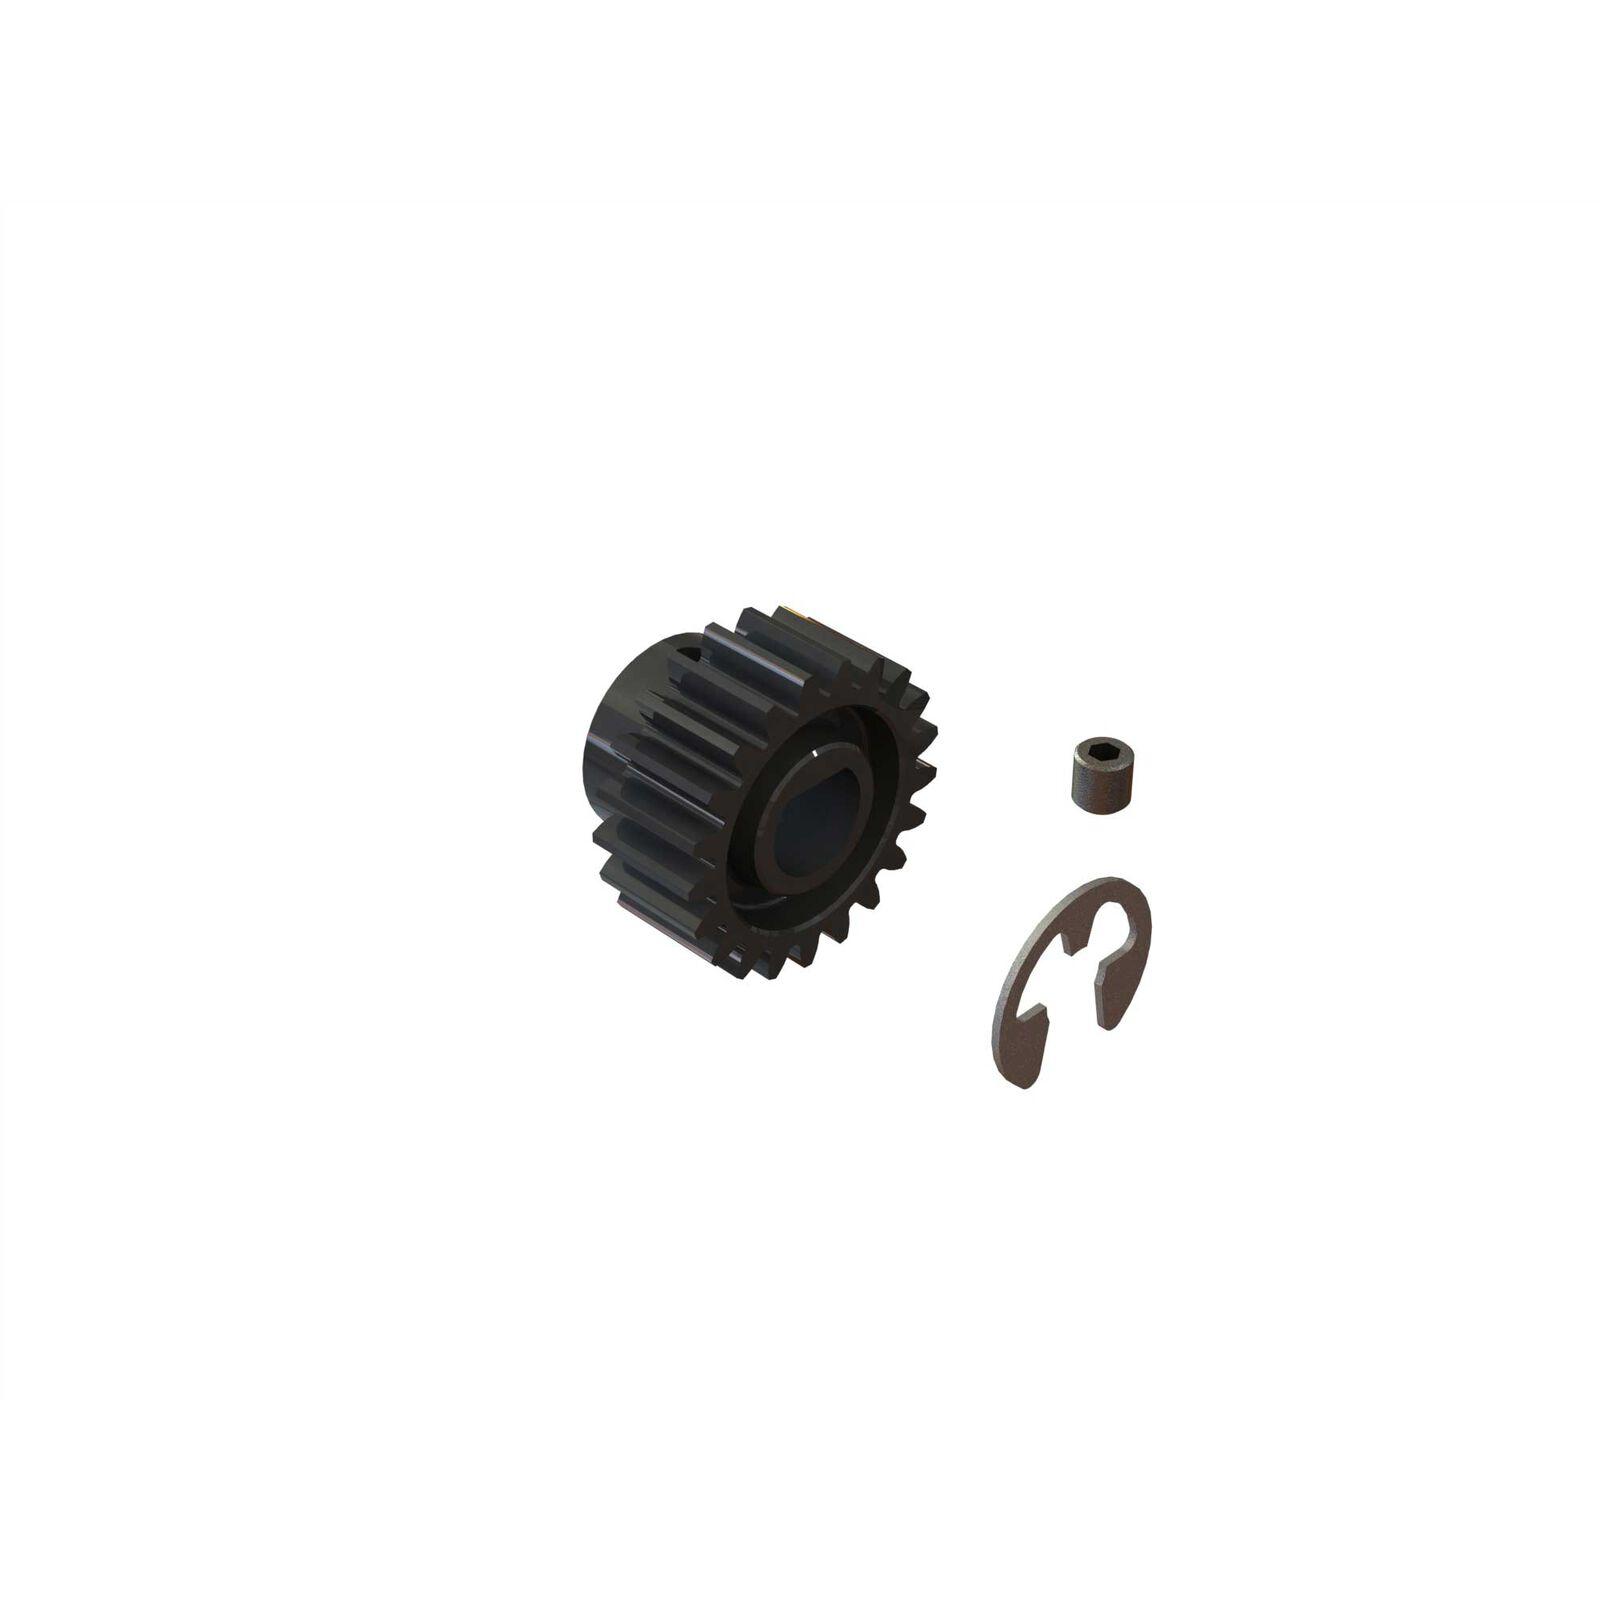 21T Mod1 Safe-D8 Pinion Gear